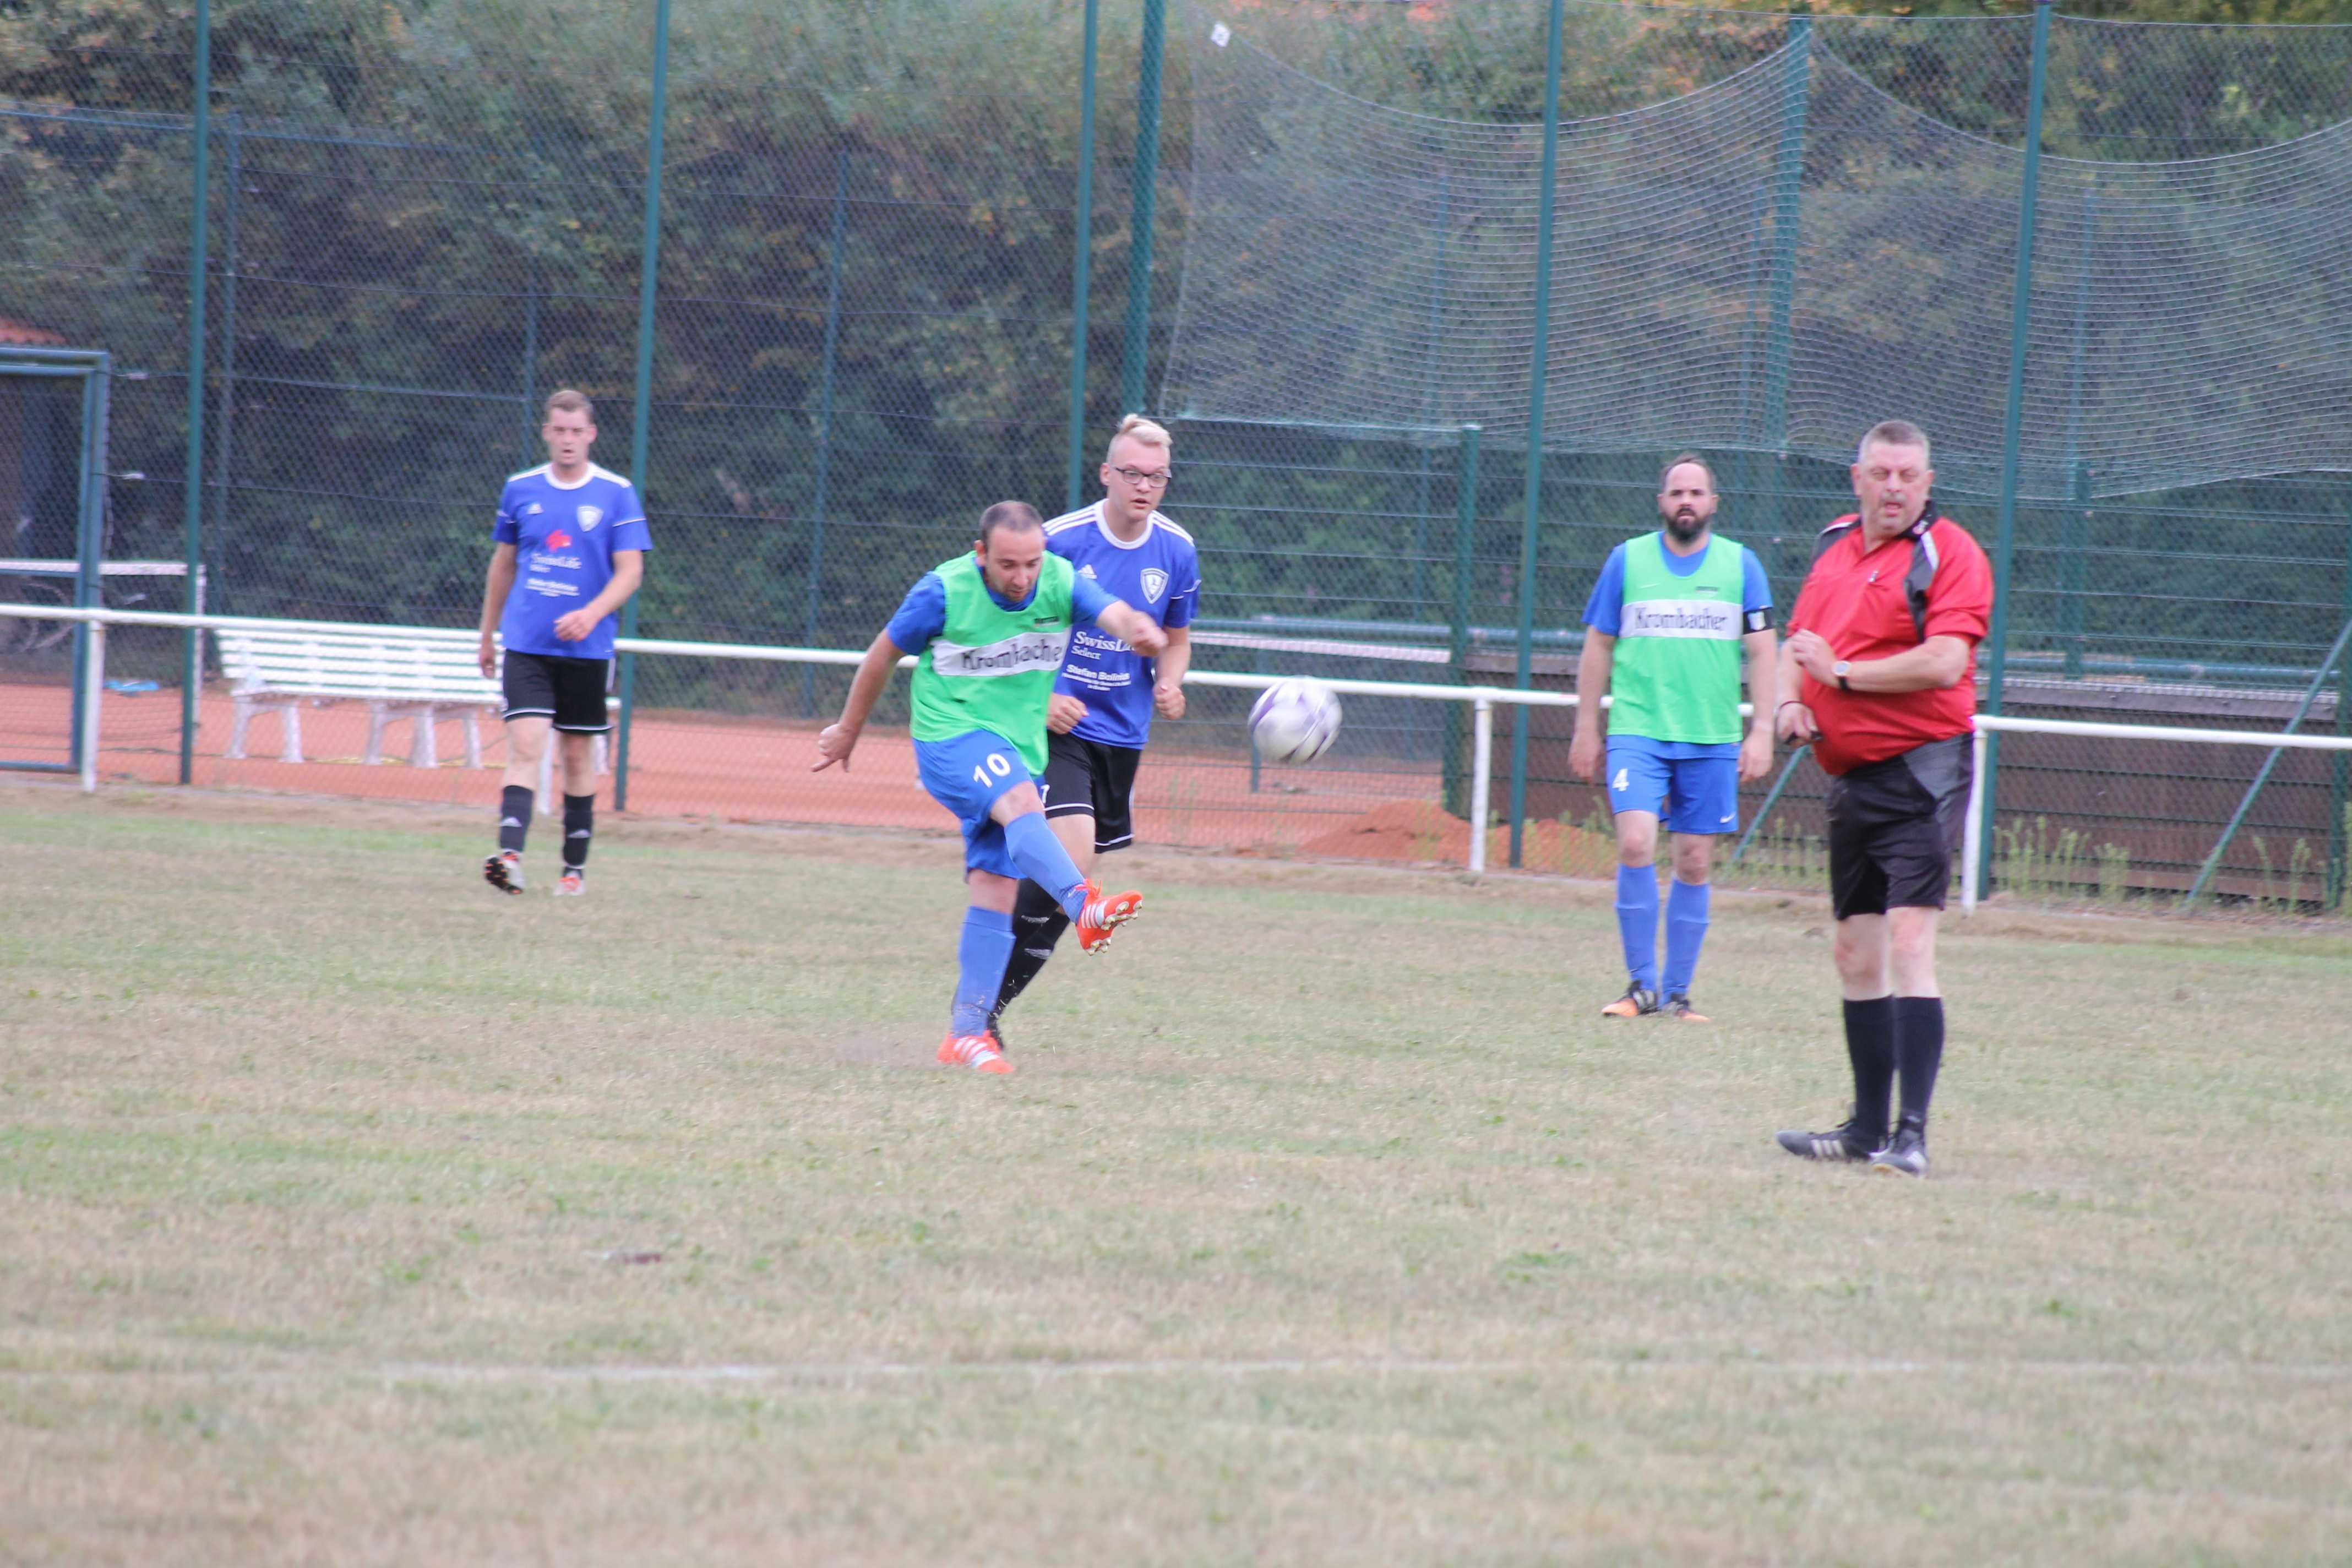 2018-07-29 Sportwoche - Sportpicknick & Football & Fußball (103)